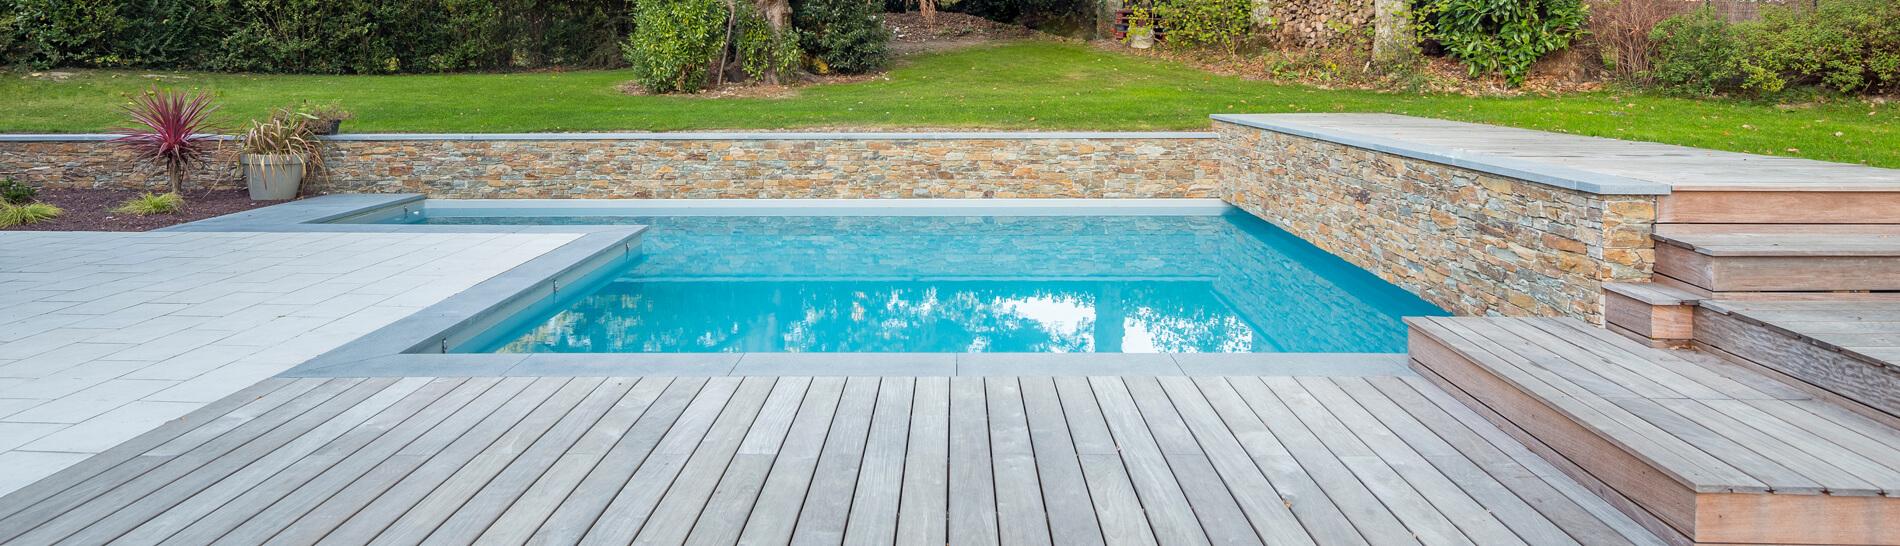 Construction de piscine Morbihan